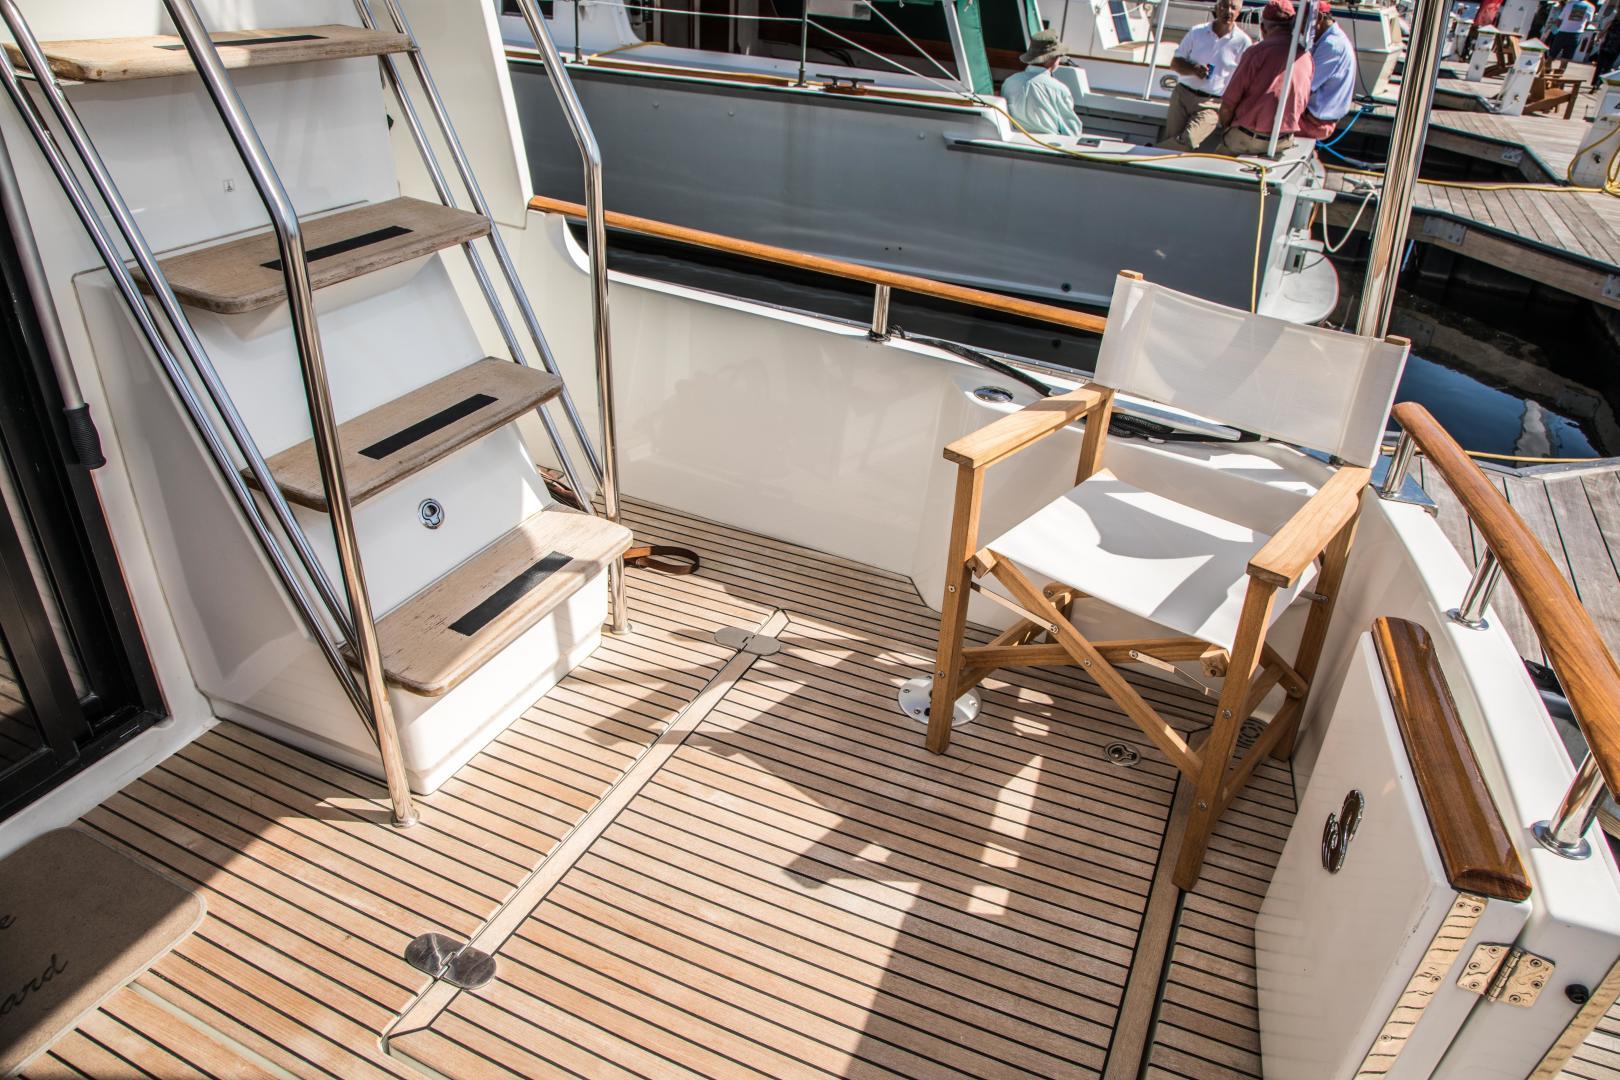 Beneteau-Swift Trawler 2012-MLC IV Baltimore-Maryland-United States-1355987 | Thumbnail